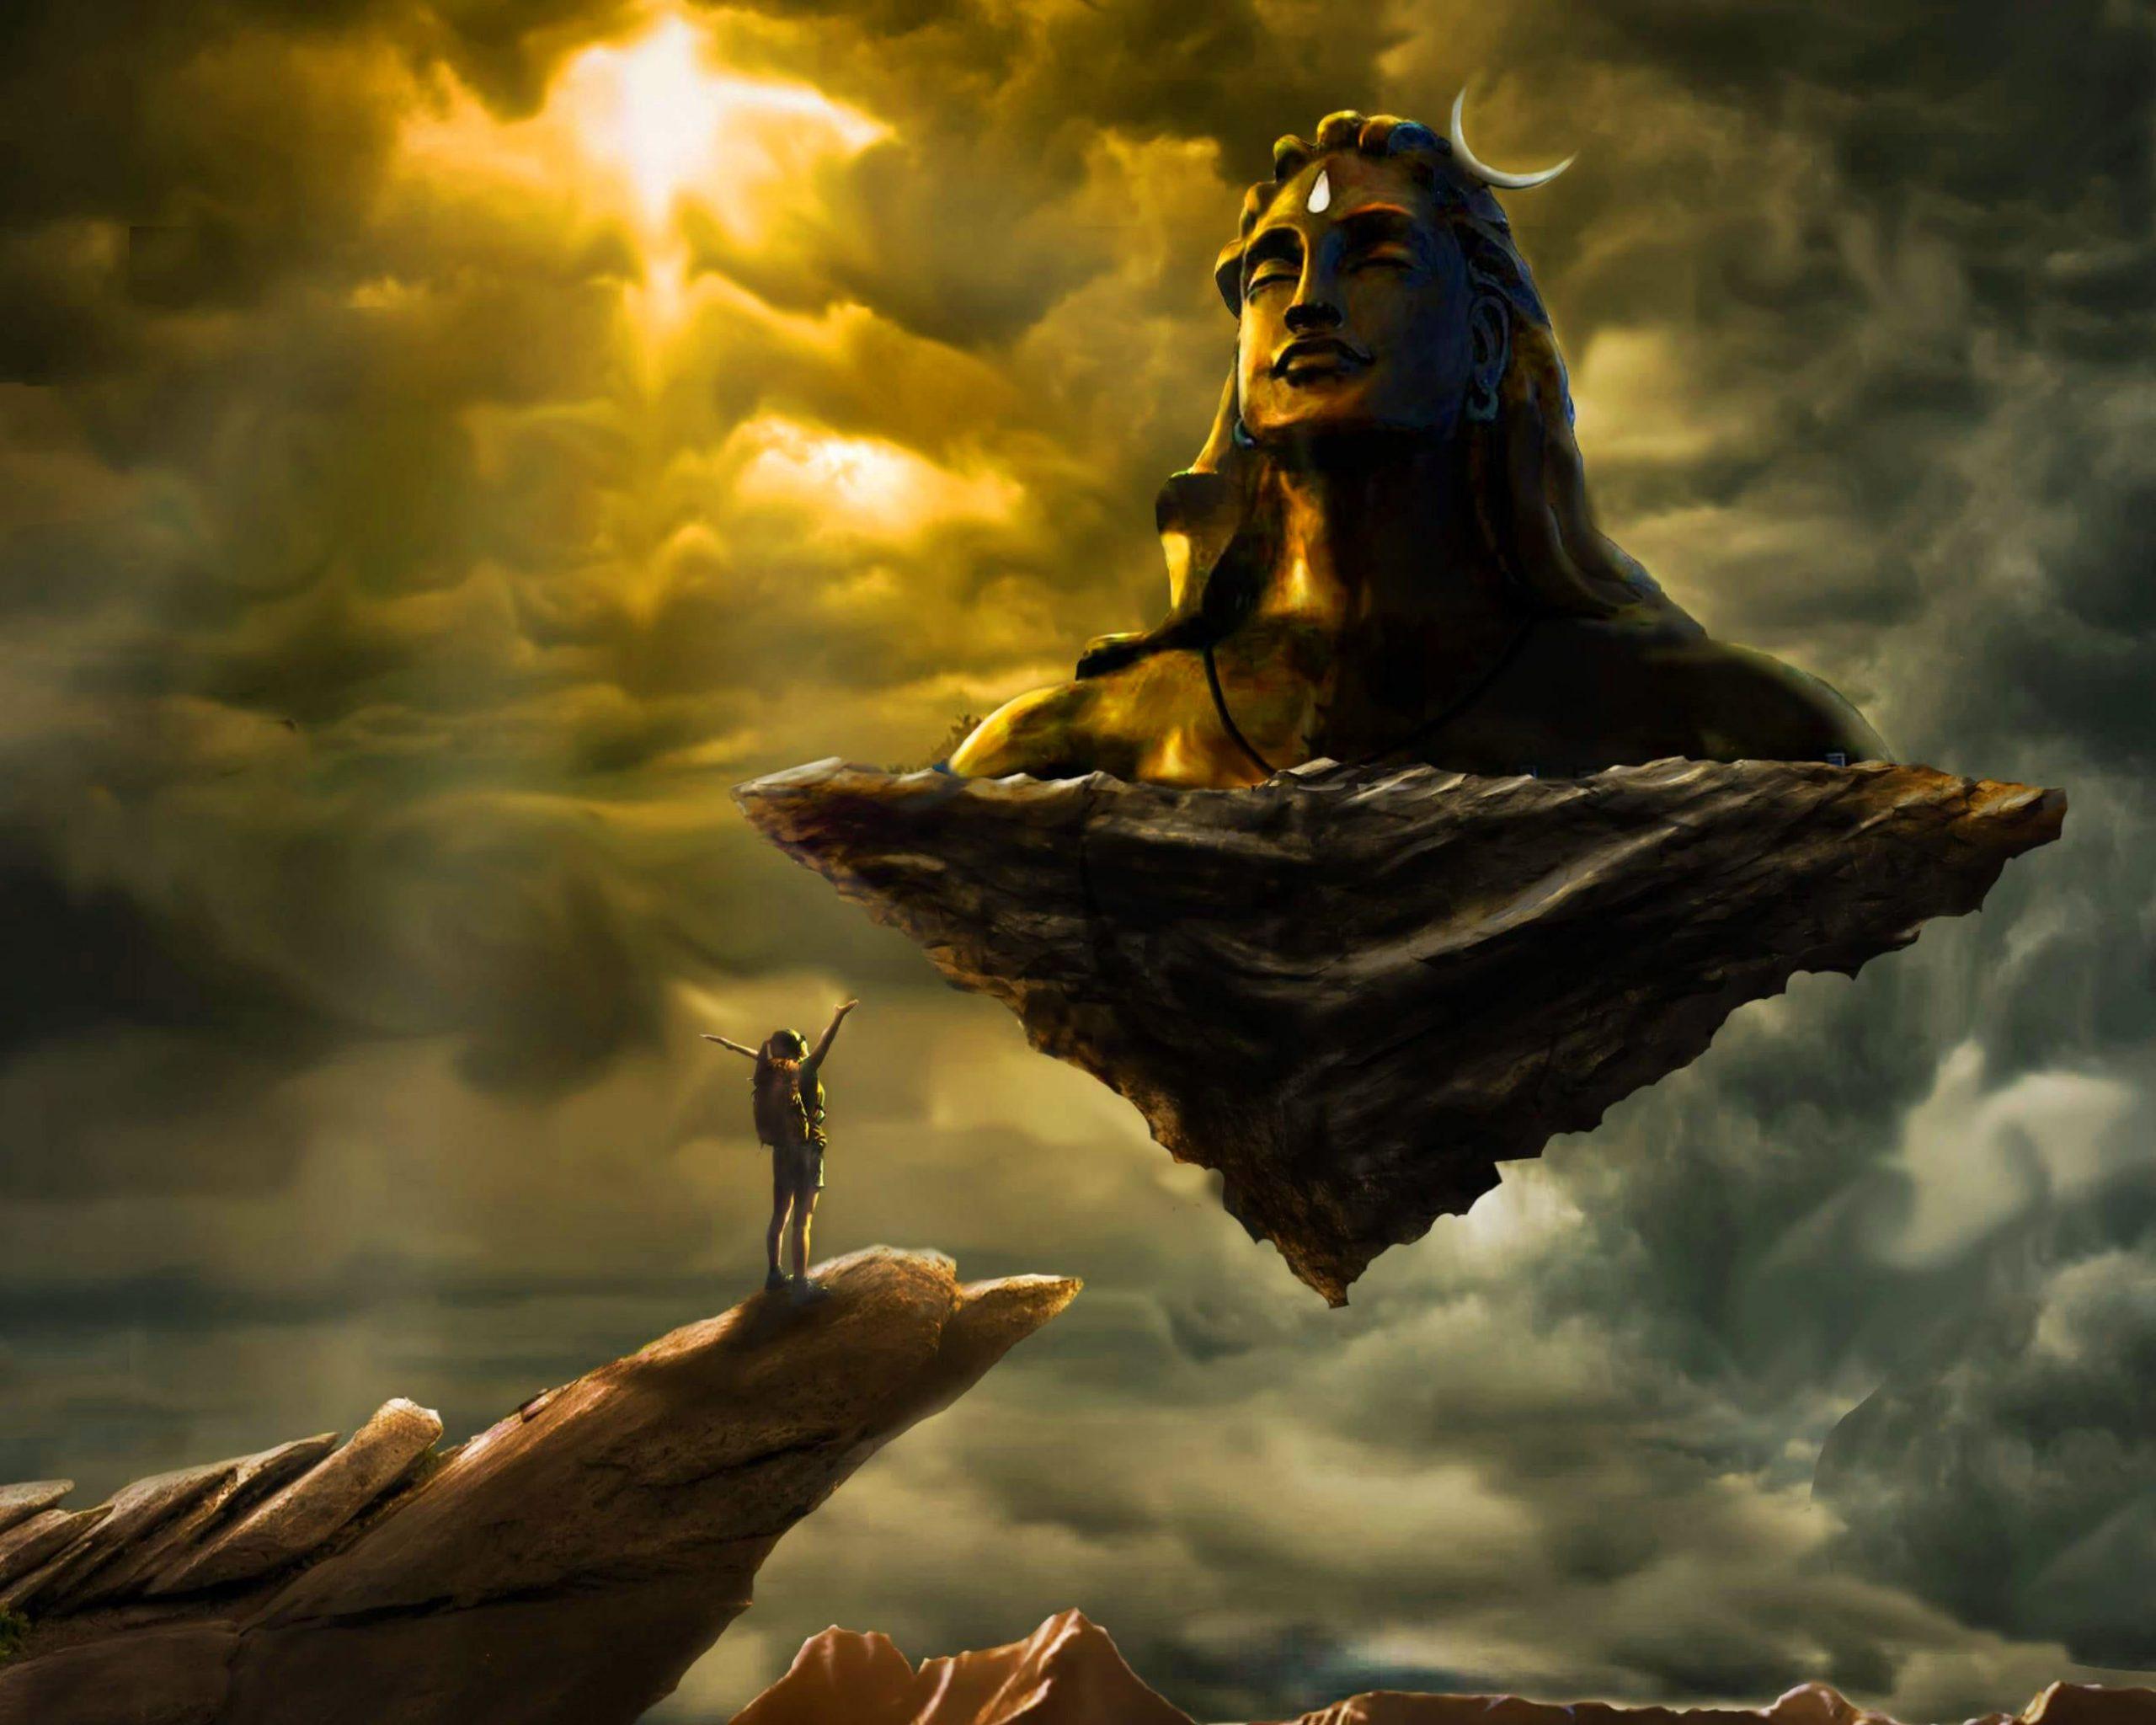 Shiva Images photo pics for whatsapp